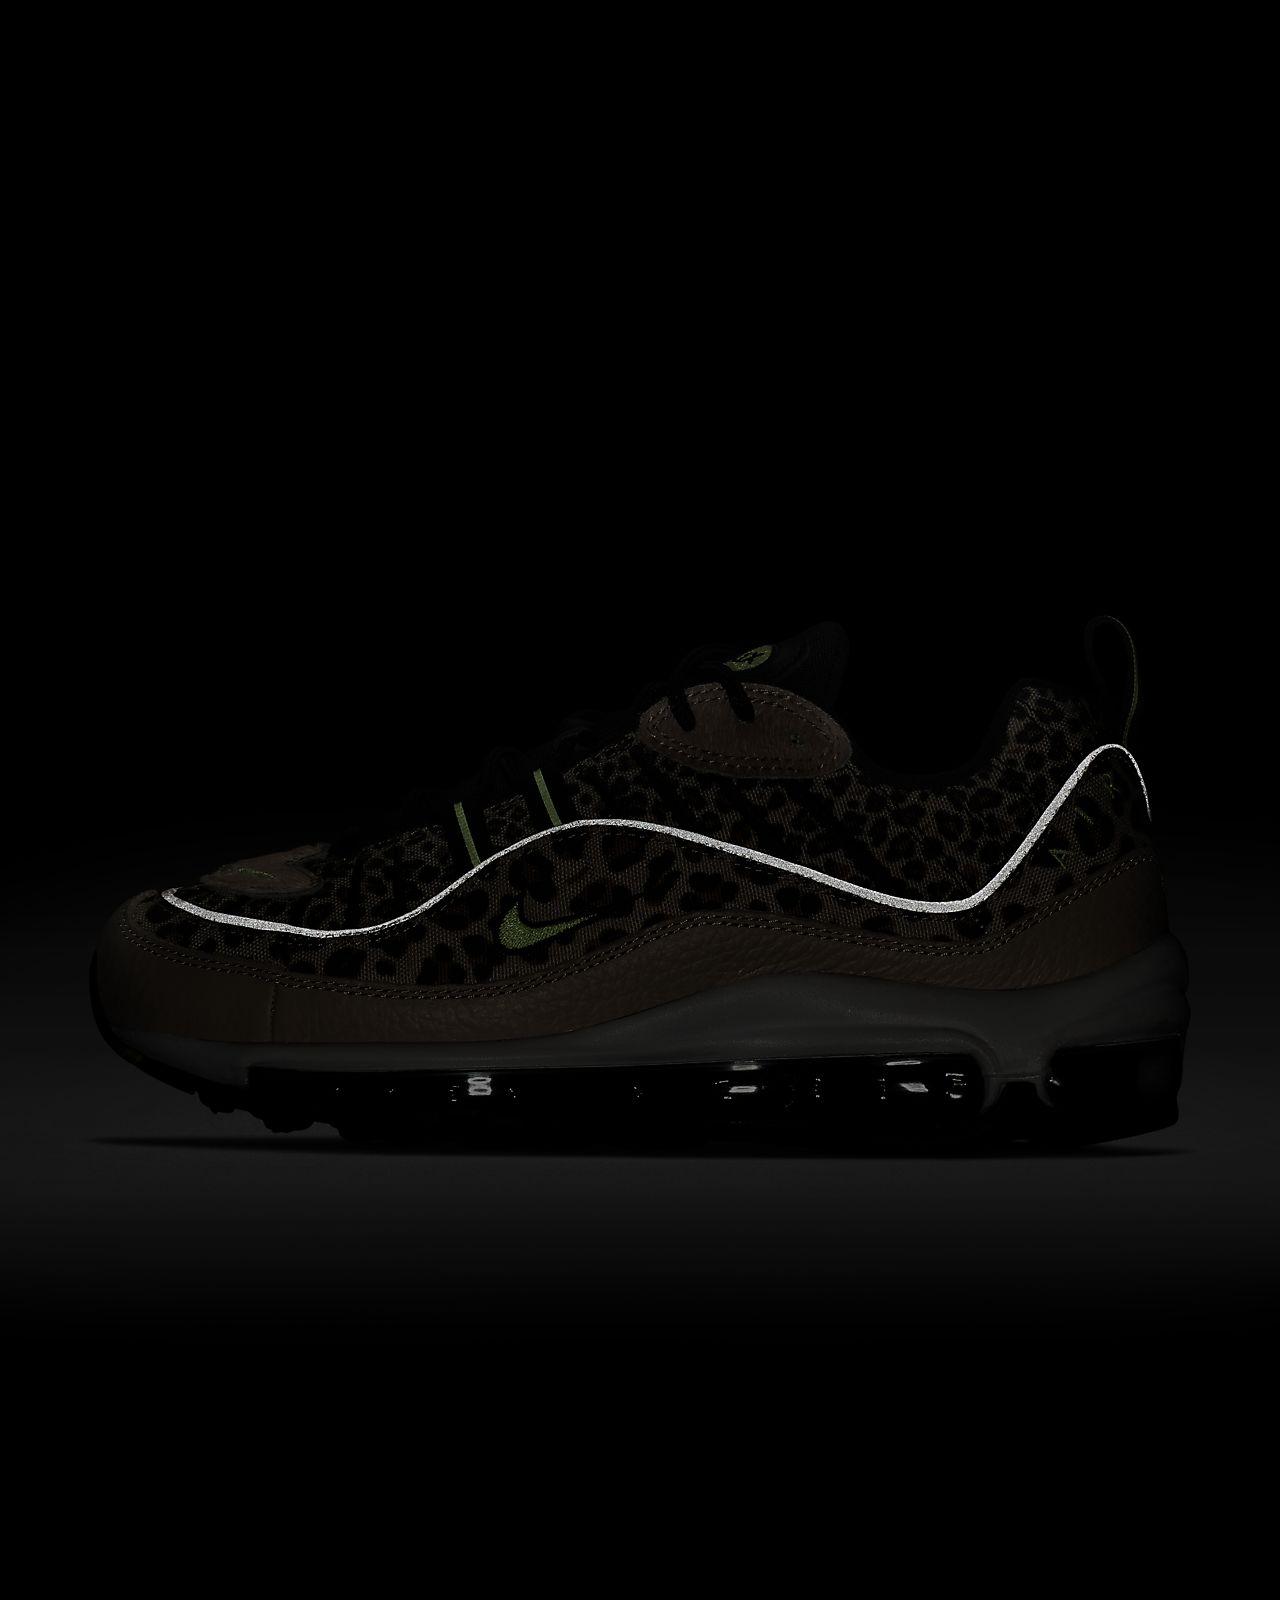 5dce344b83 Nike Air Max 98 Premium Animal Women's Shoe. Nike.com